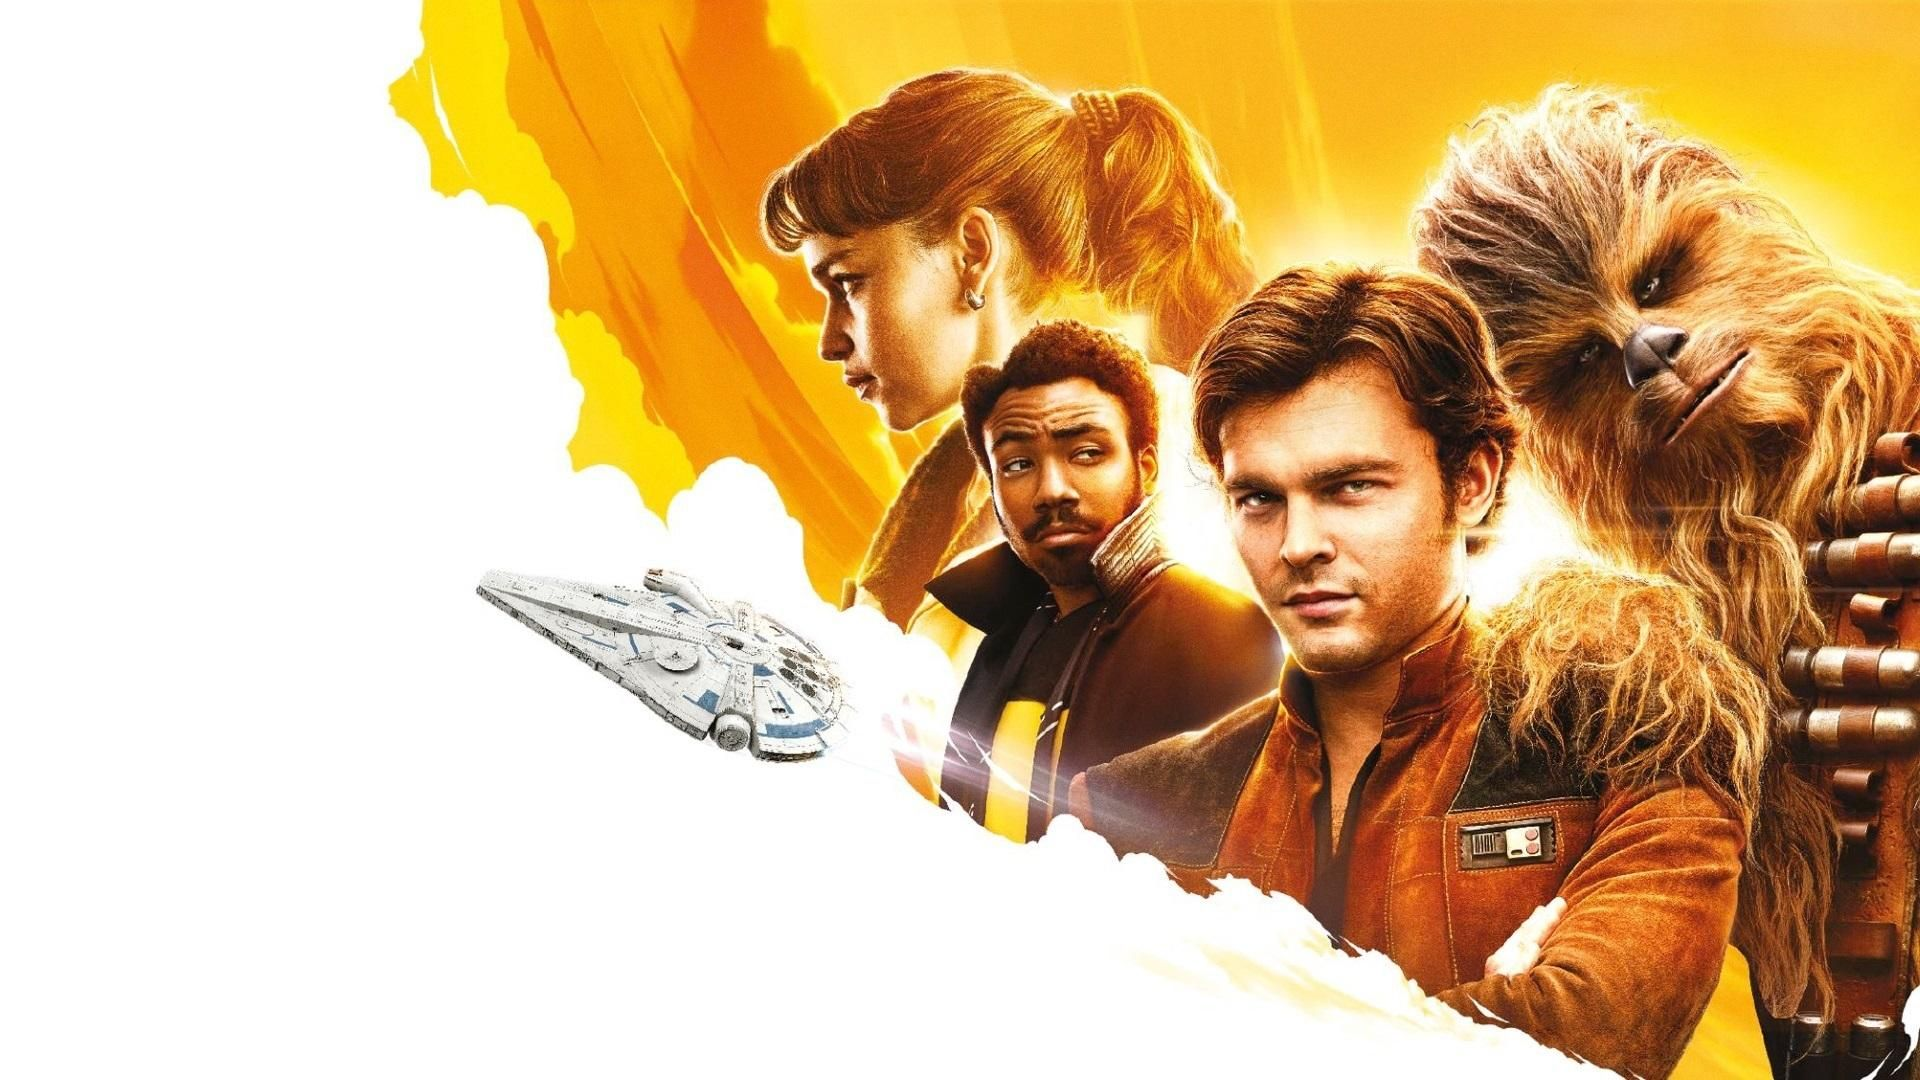 16 Luxury Pubg Wallpaper Iphone 6: Star Wars Han Solo Movie Wallpaper [1920x1080]